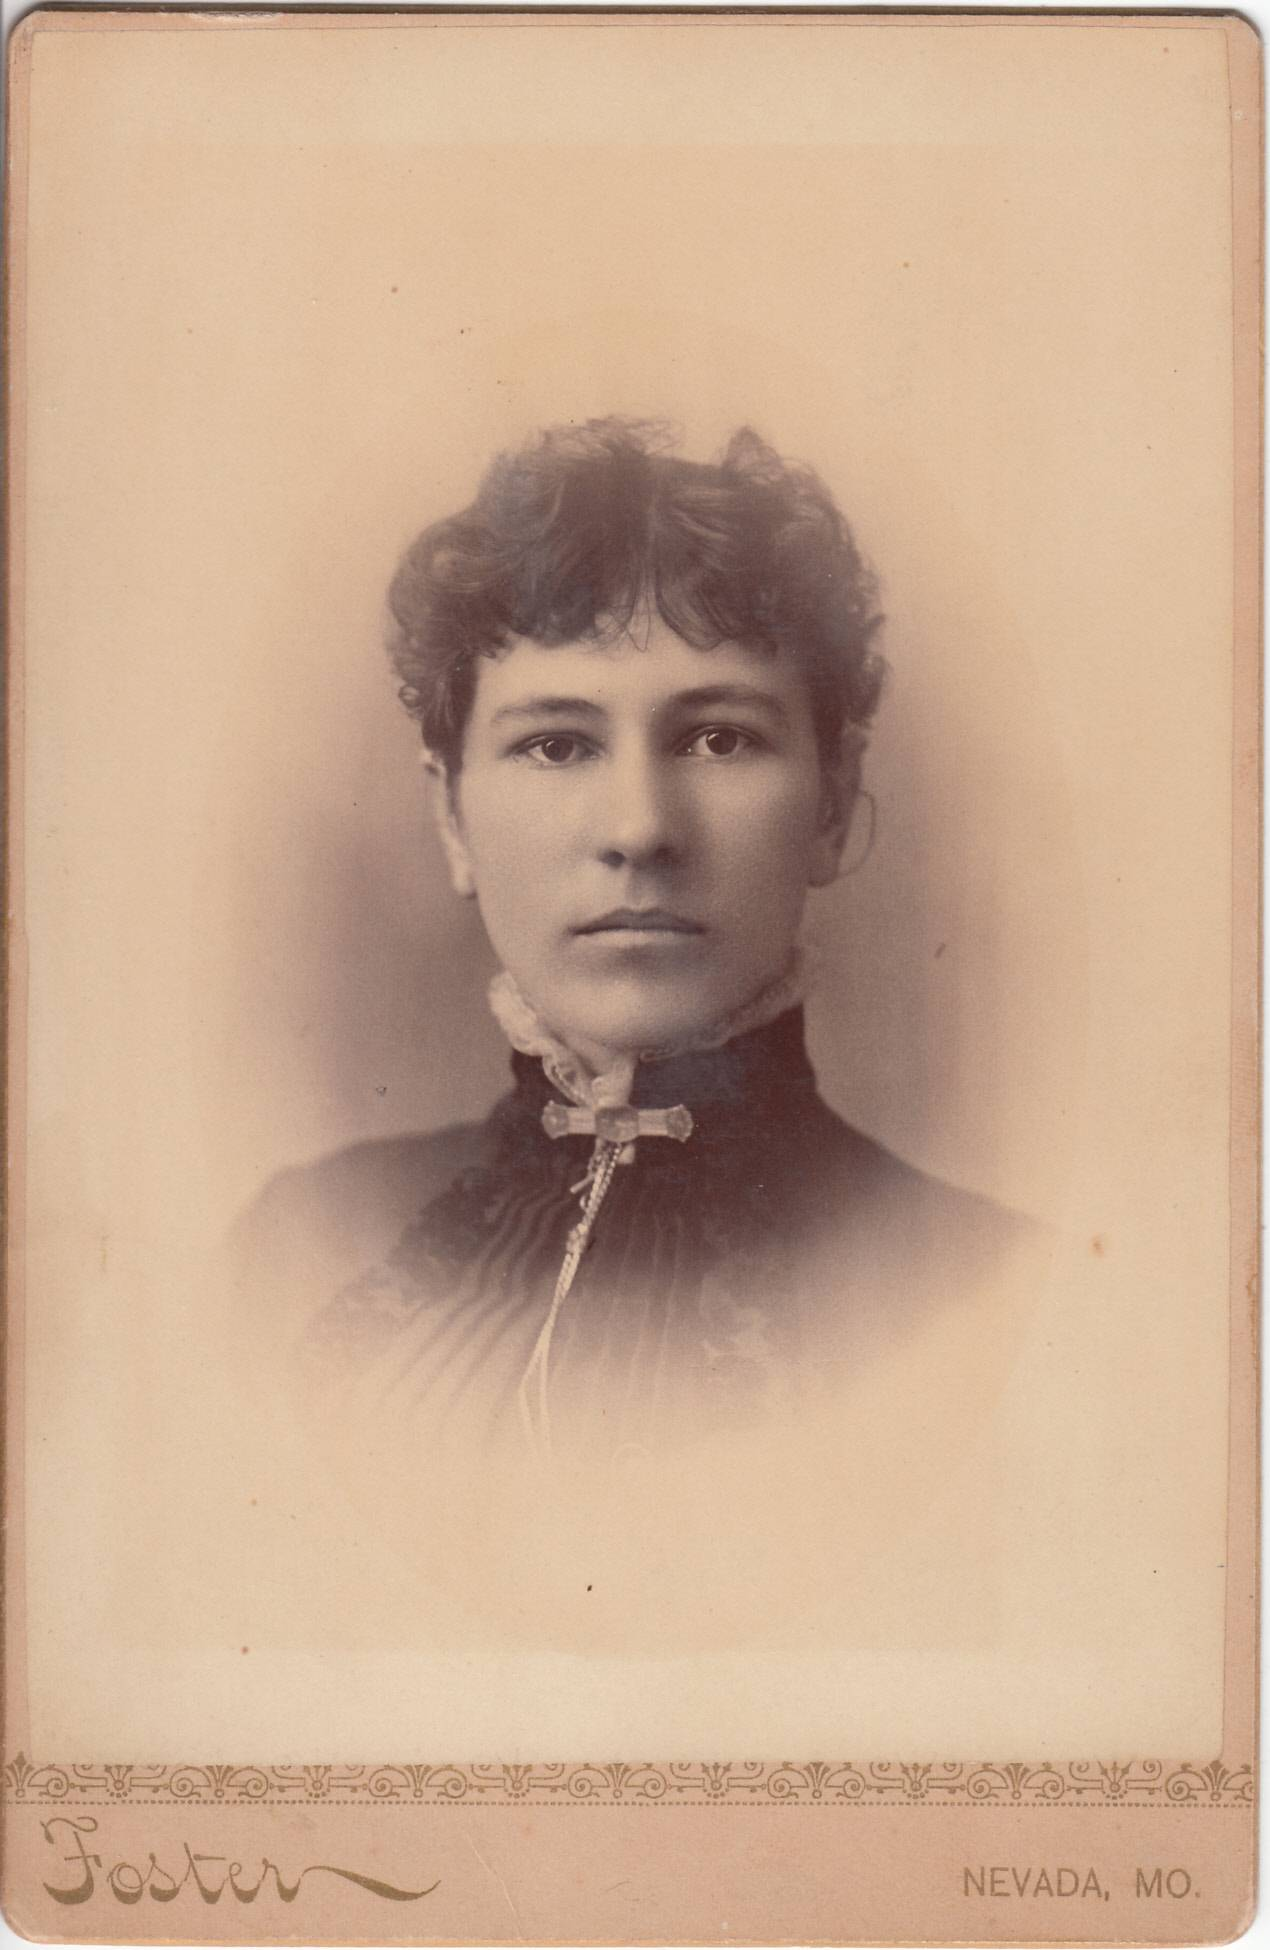 C. E. Foster, photographer of Nevada, Missouri